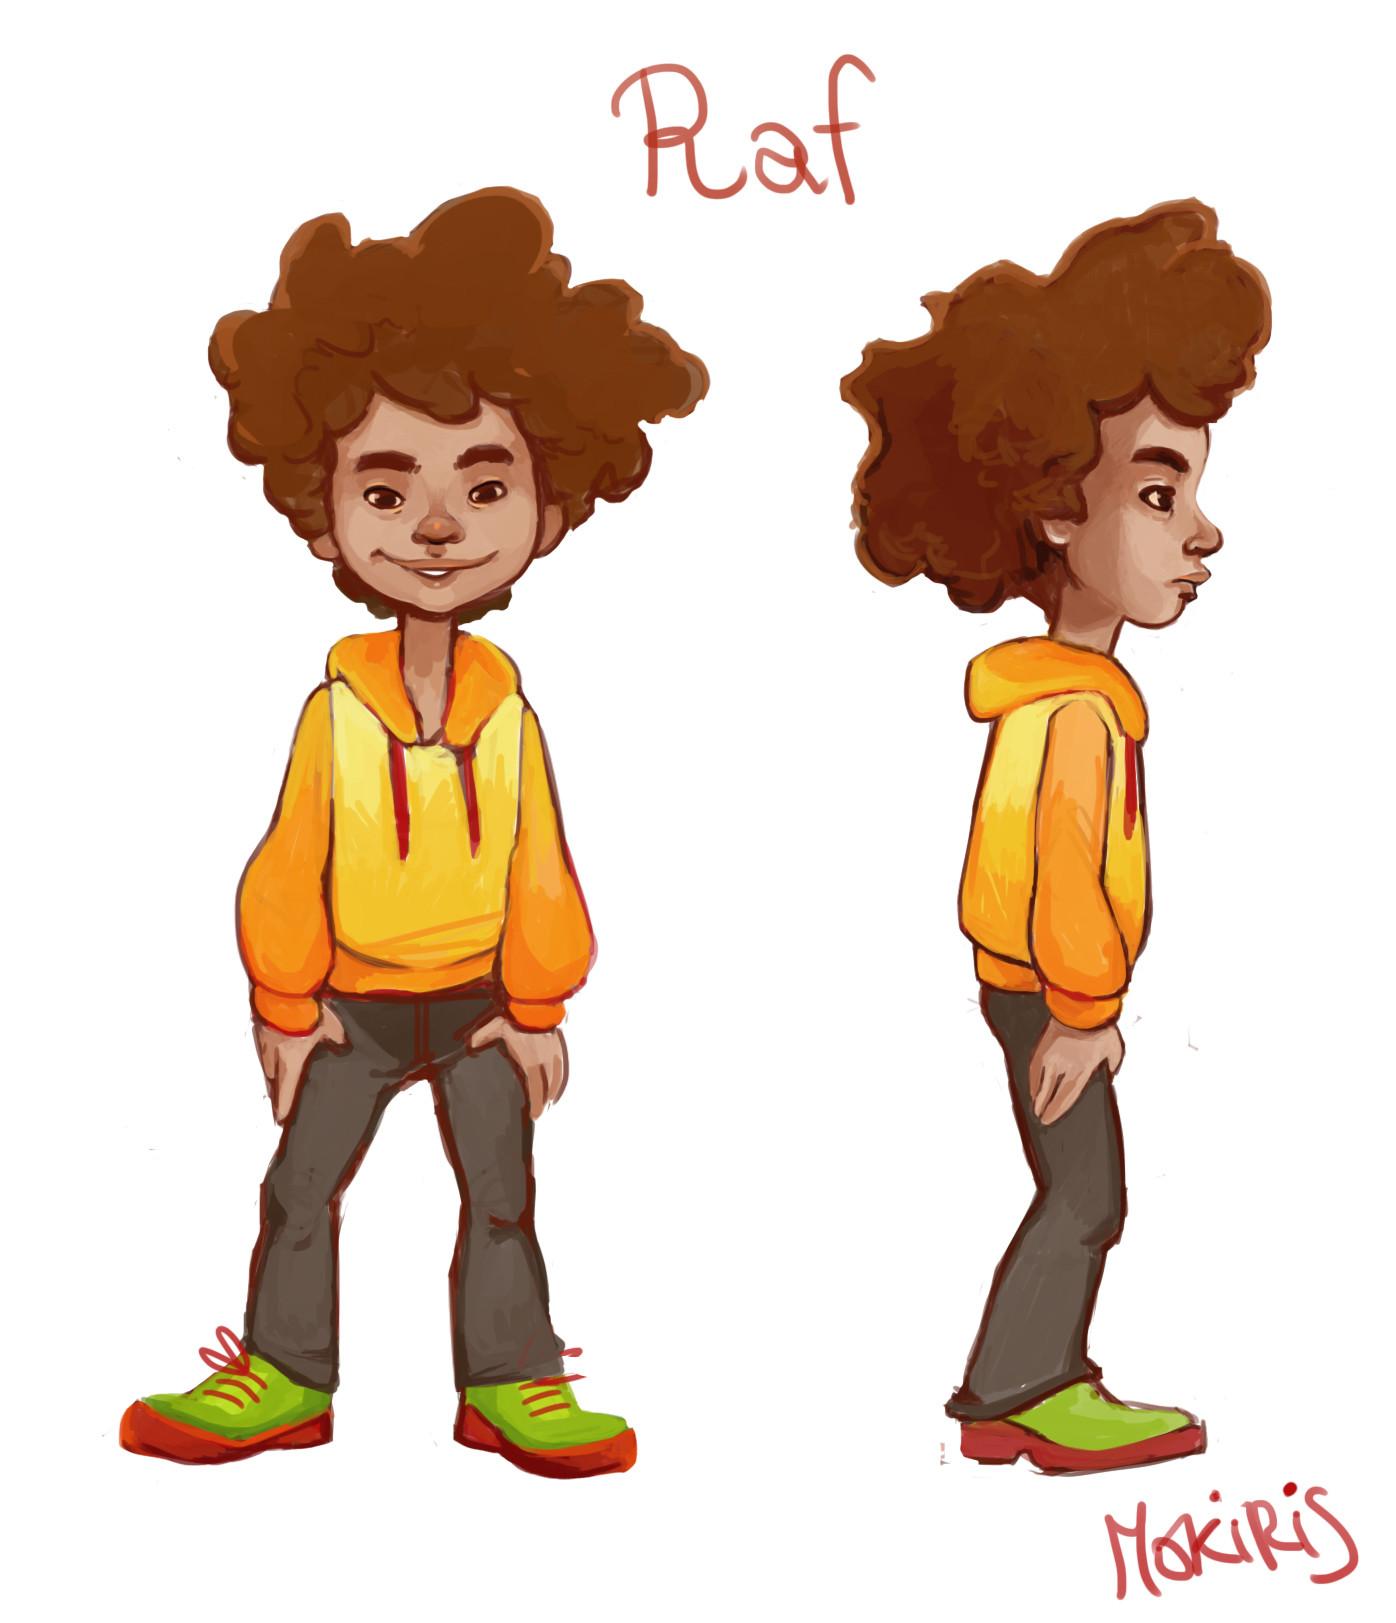 Raf, the Nina's friend